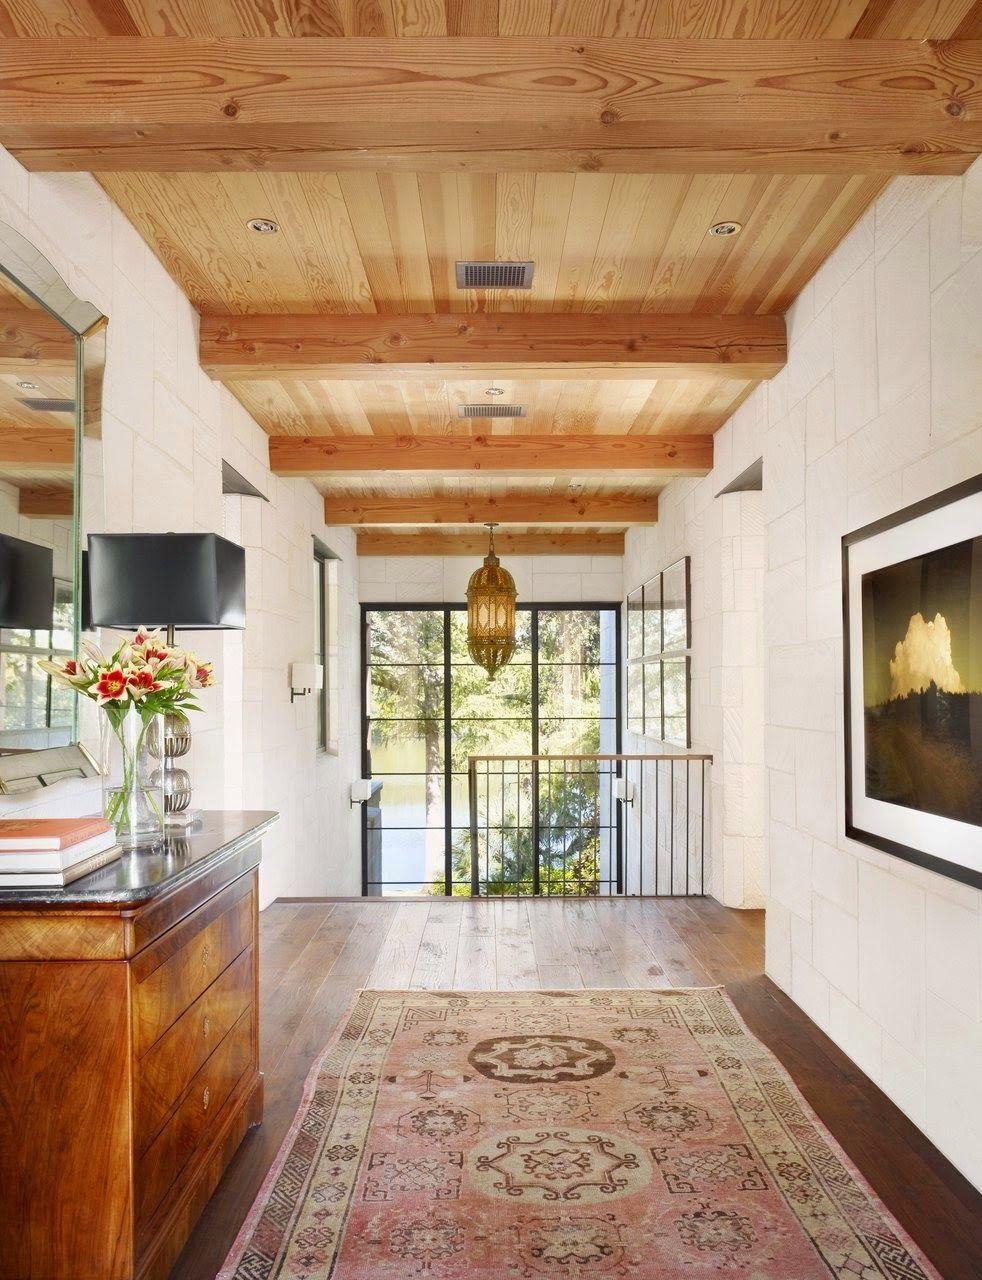 Everything Ceiling Floor Walls Window Etc Texas Home Decor Modern House Design Southwest Living